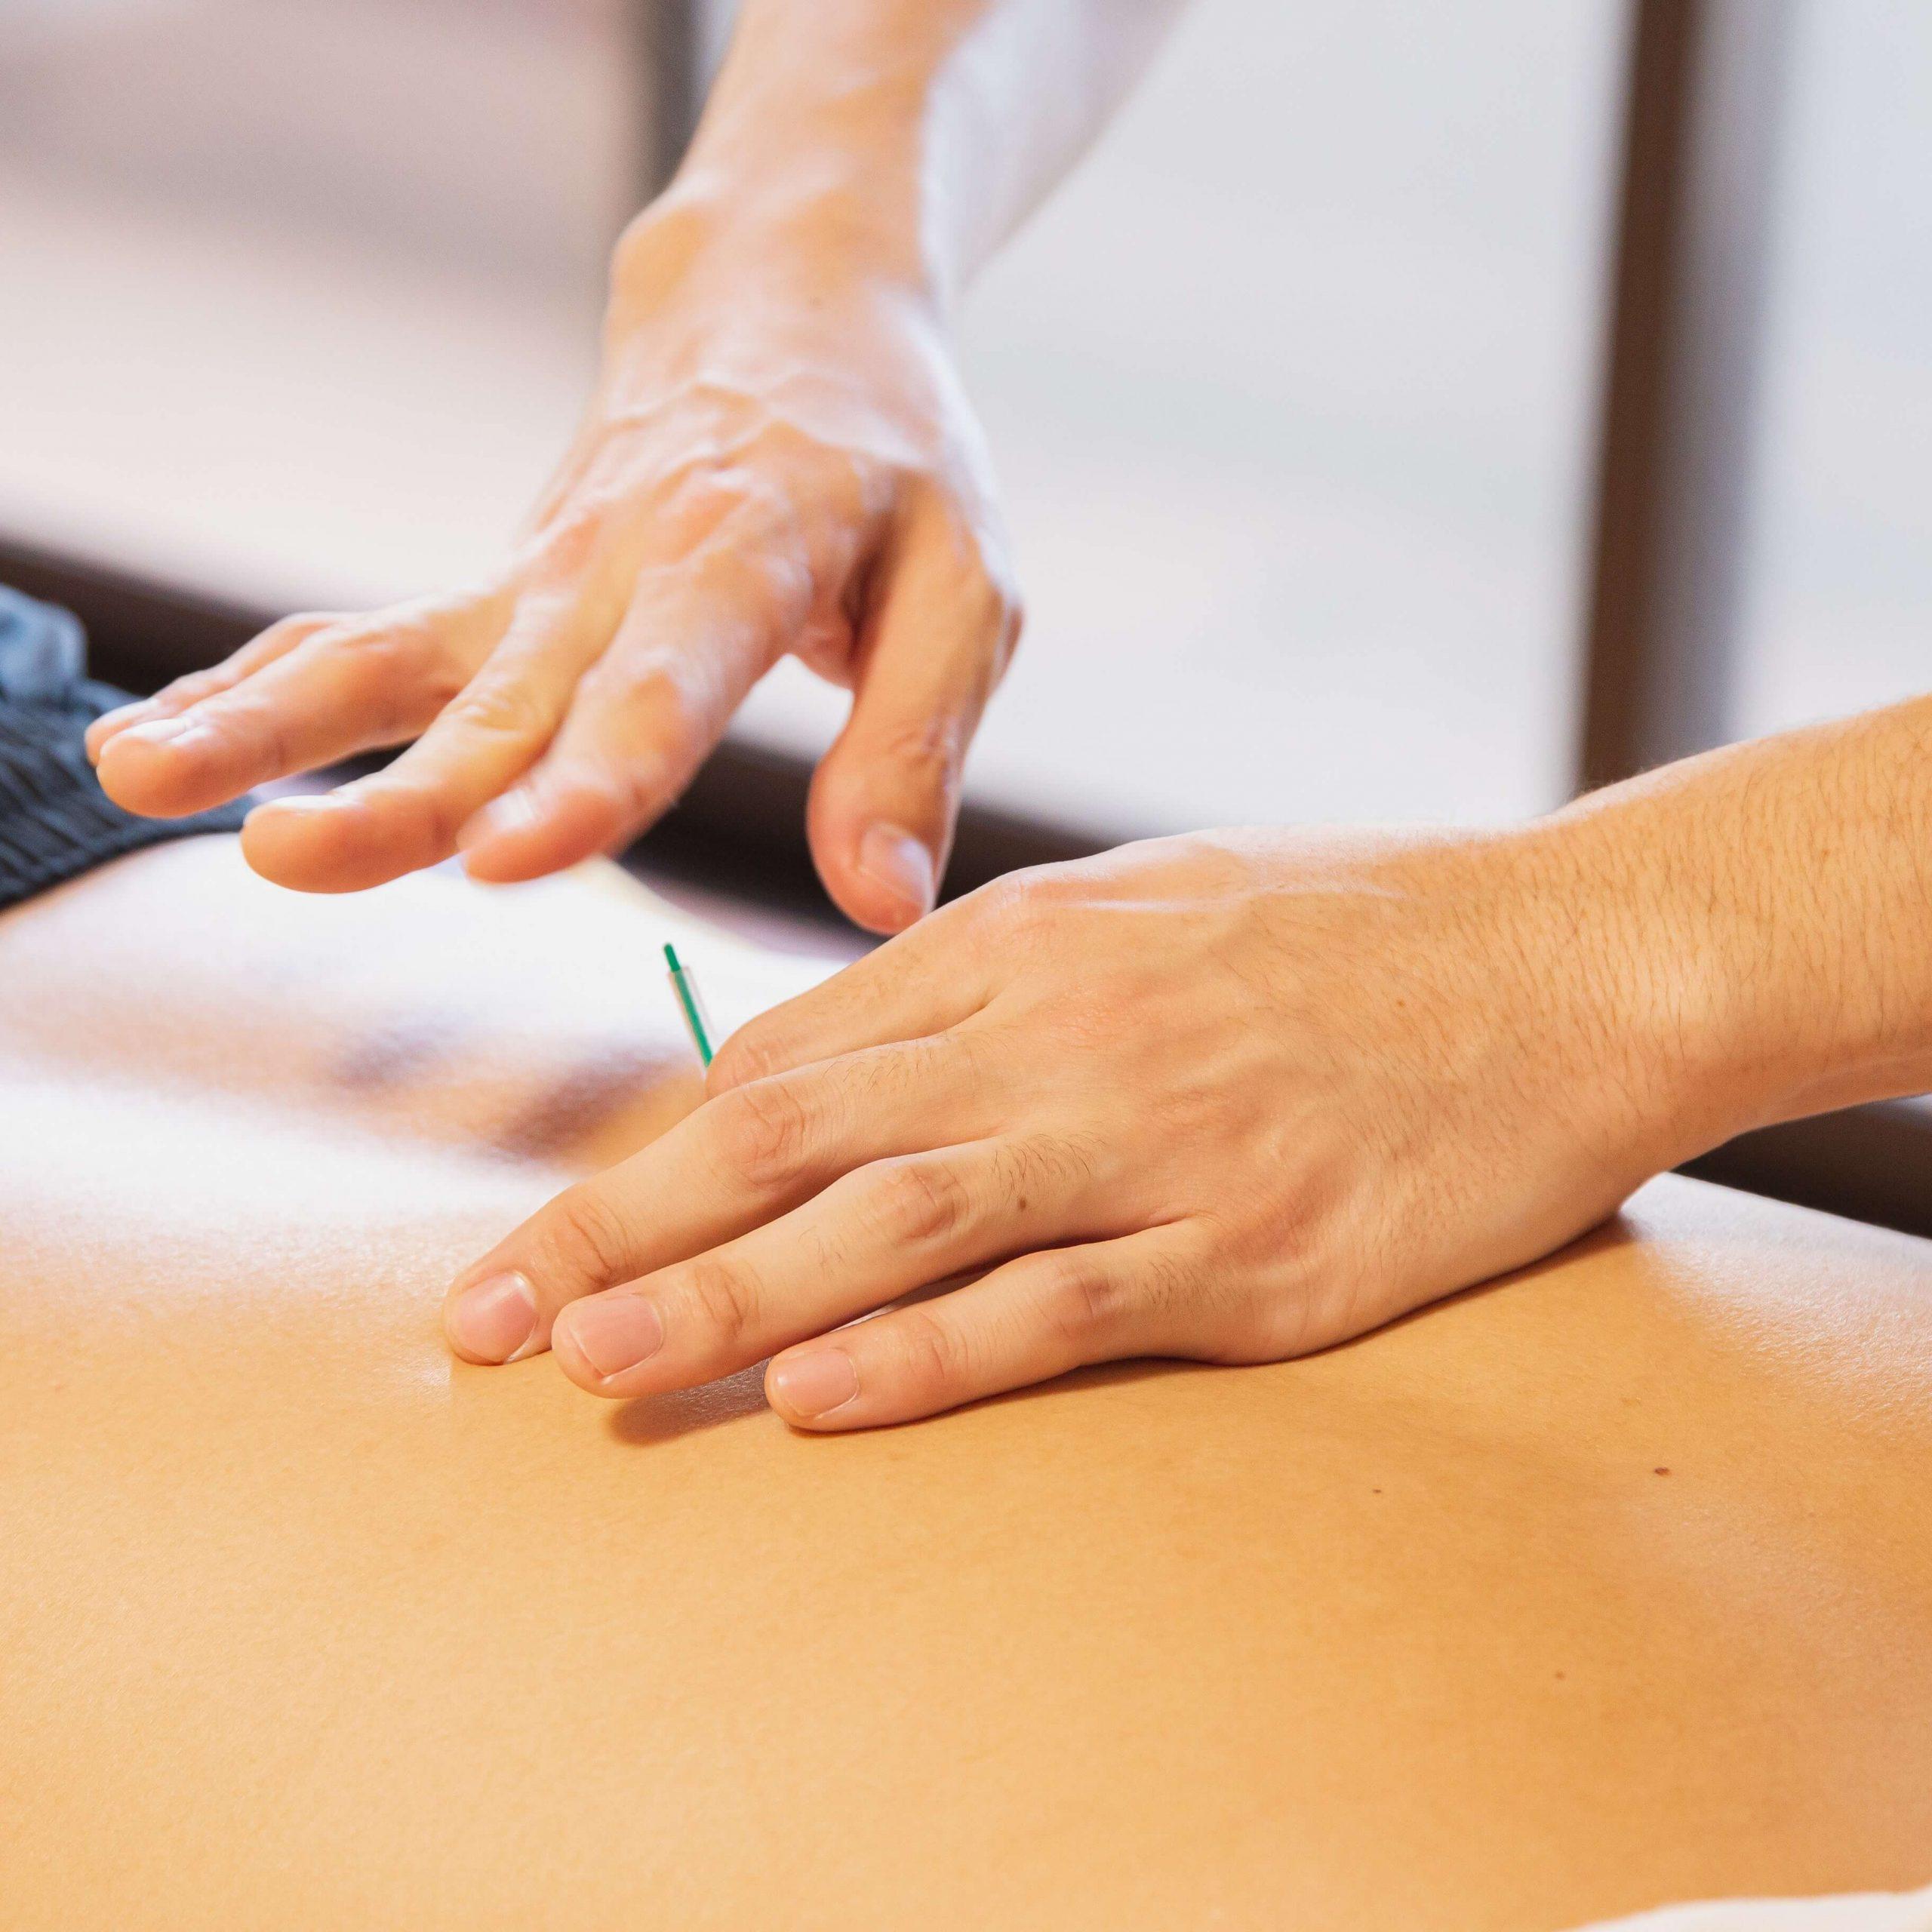 Acupressure : For Health, Longevity and Self Treatment